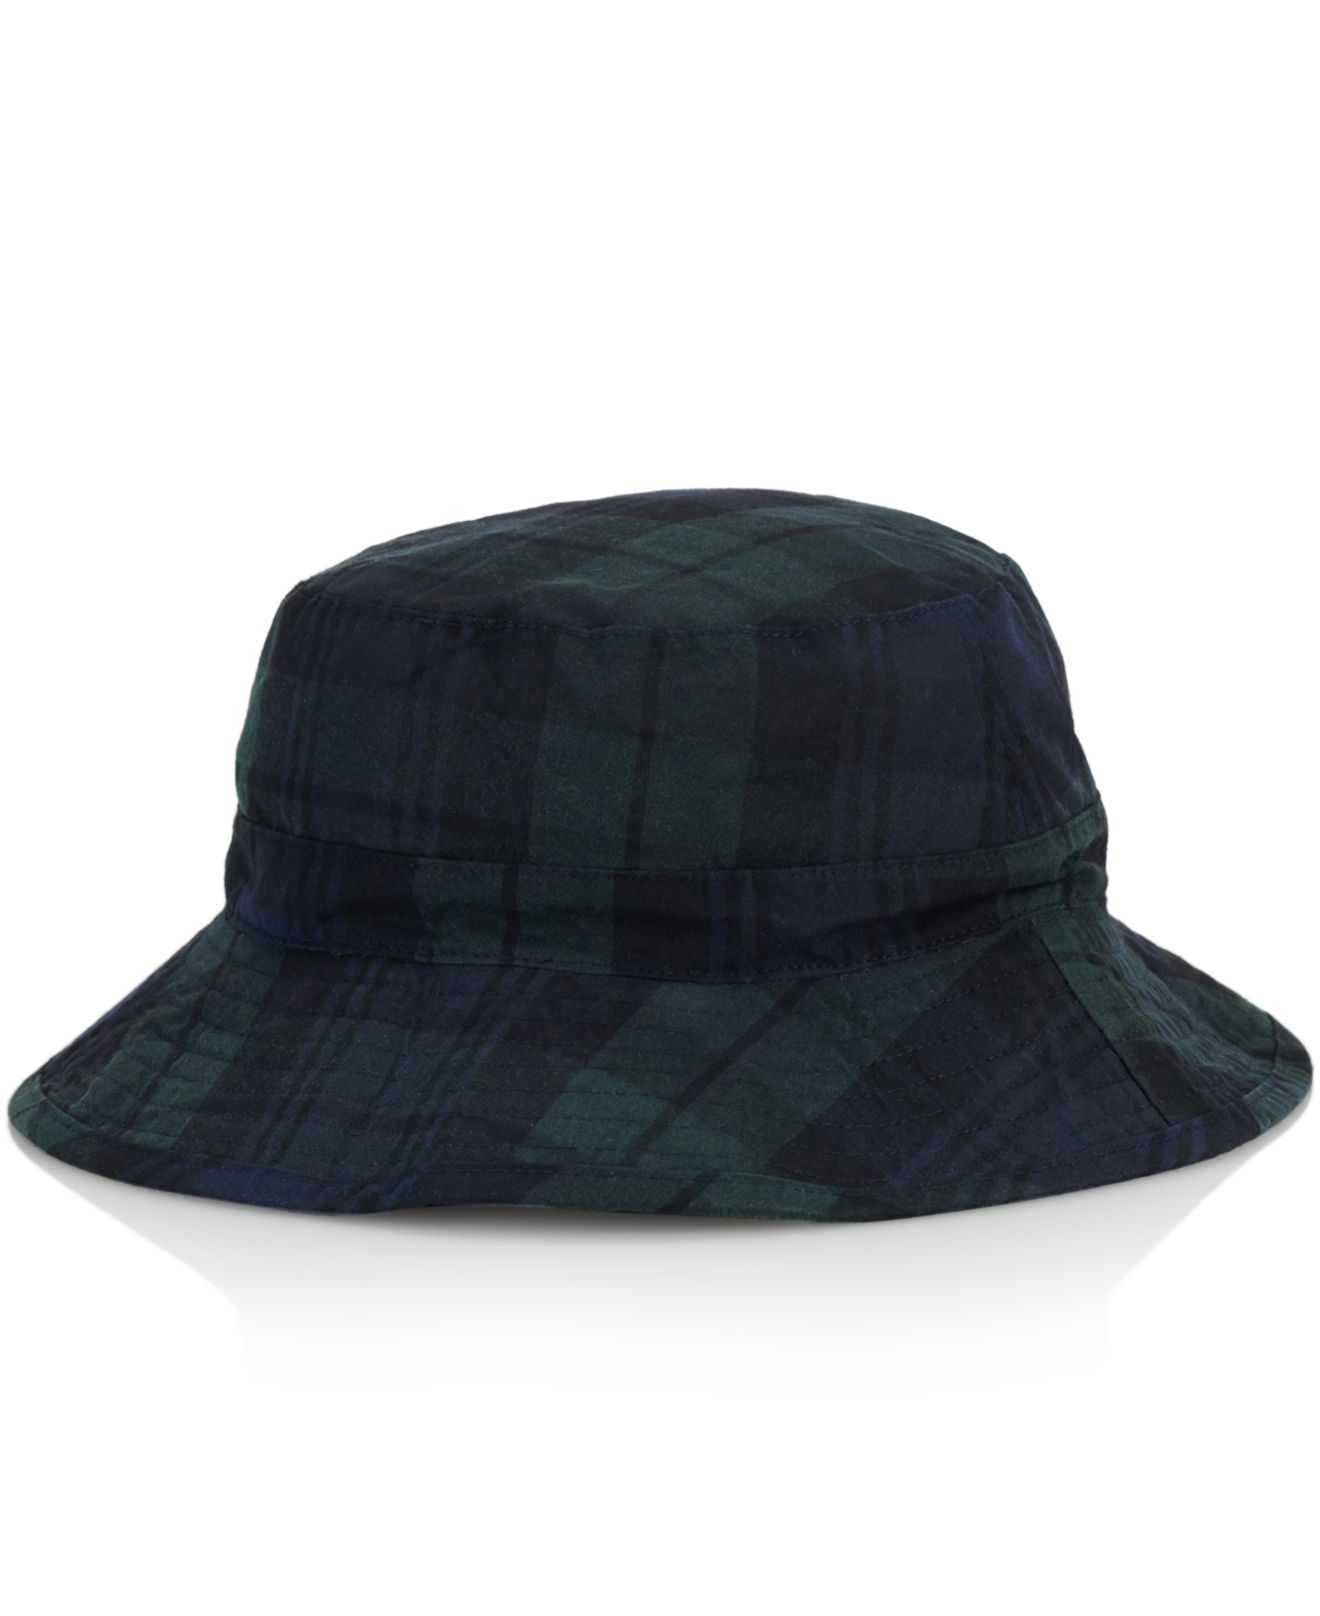 0a21f0db77d Lyst Polo Ralph Lauren Tartan Oilcloth Bucket Hat In Black For Men